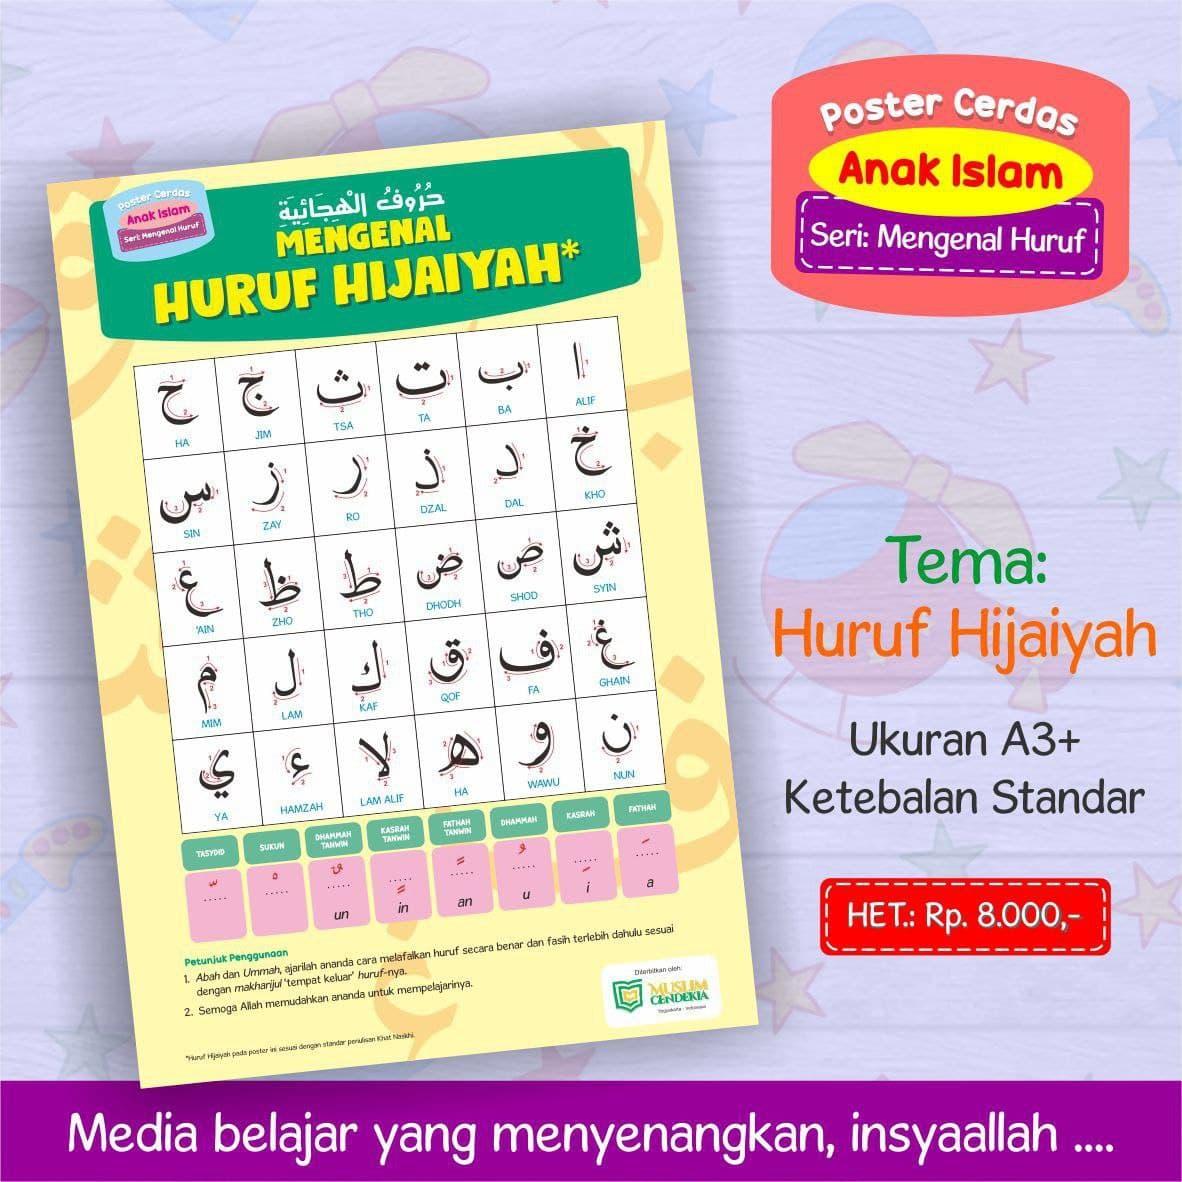 Poster Cerdas Anak Islam Poster Edukatif Muslim Cendekia